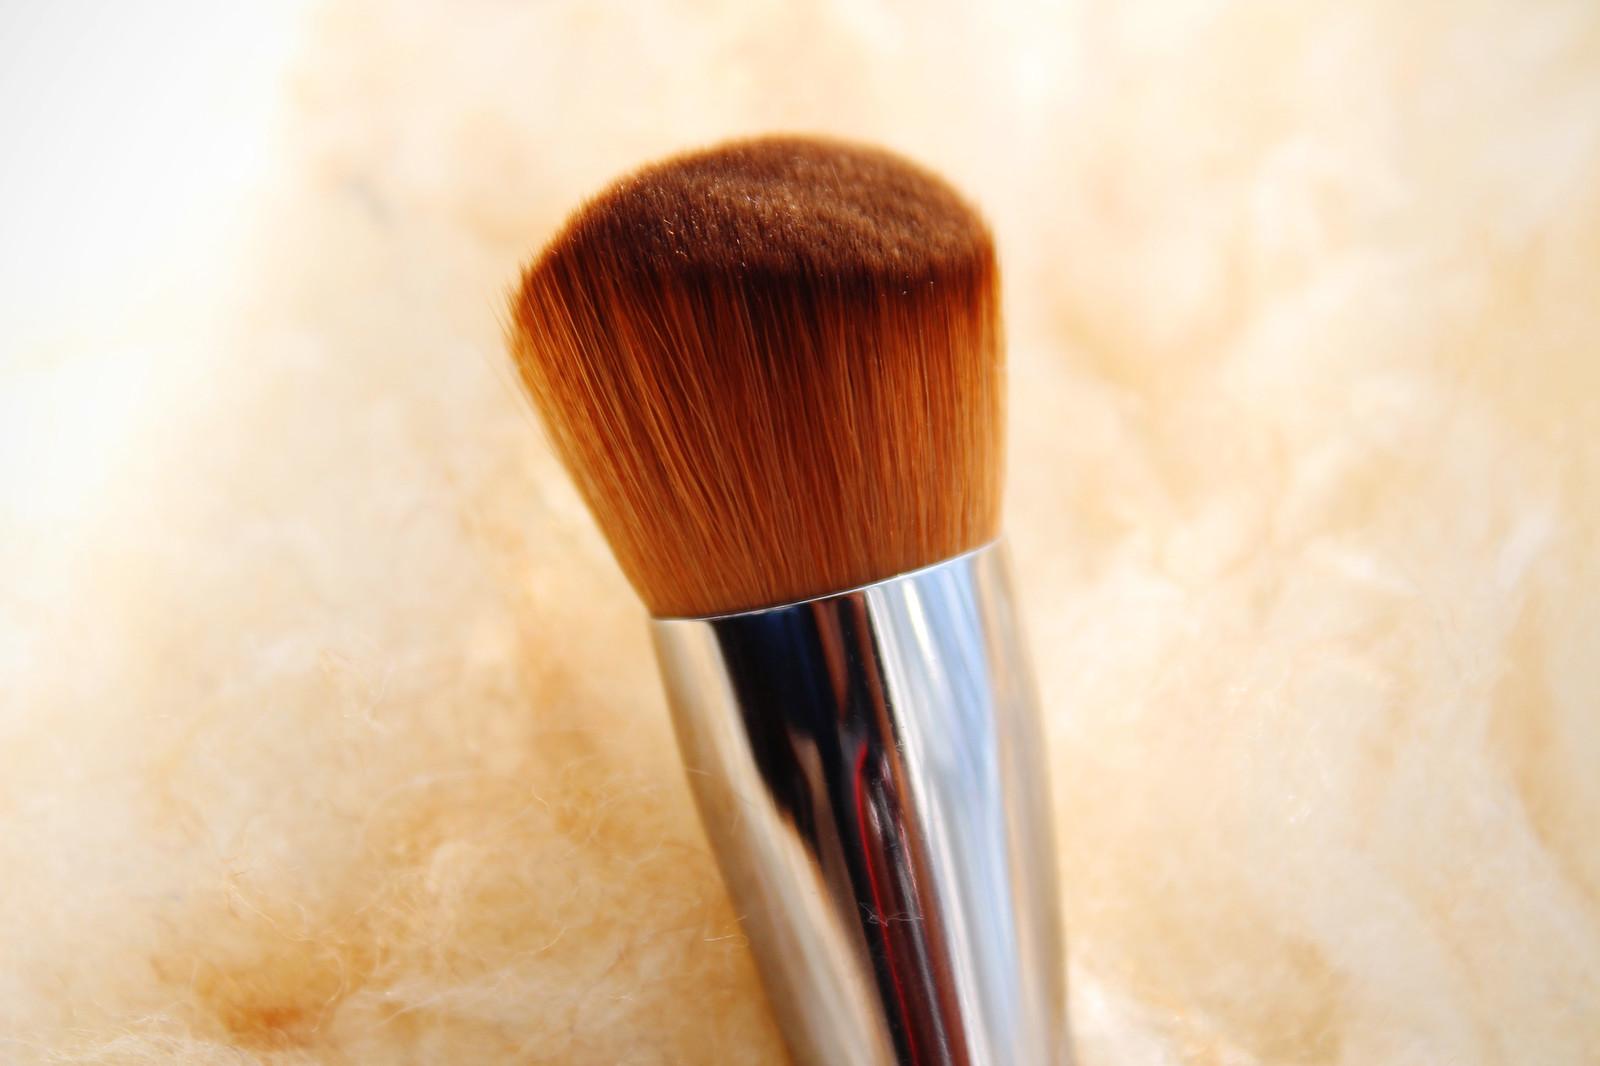 ebay-3d-hd-brush